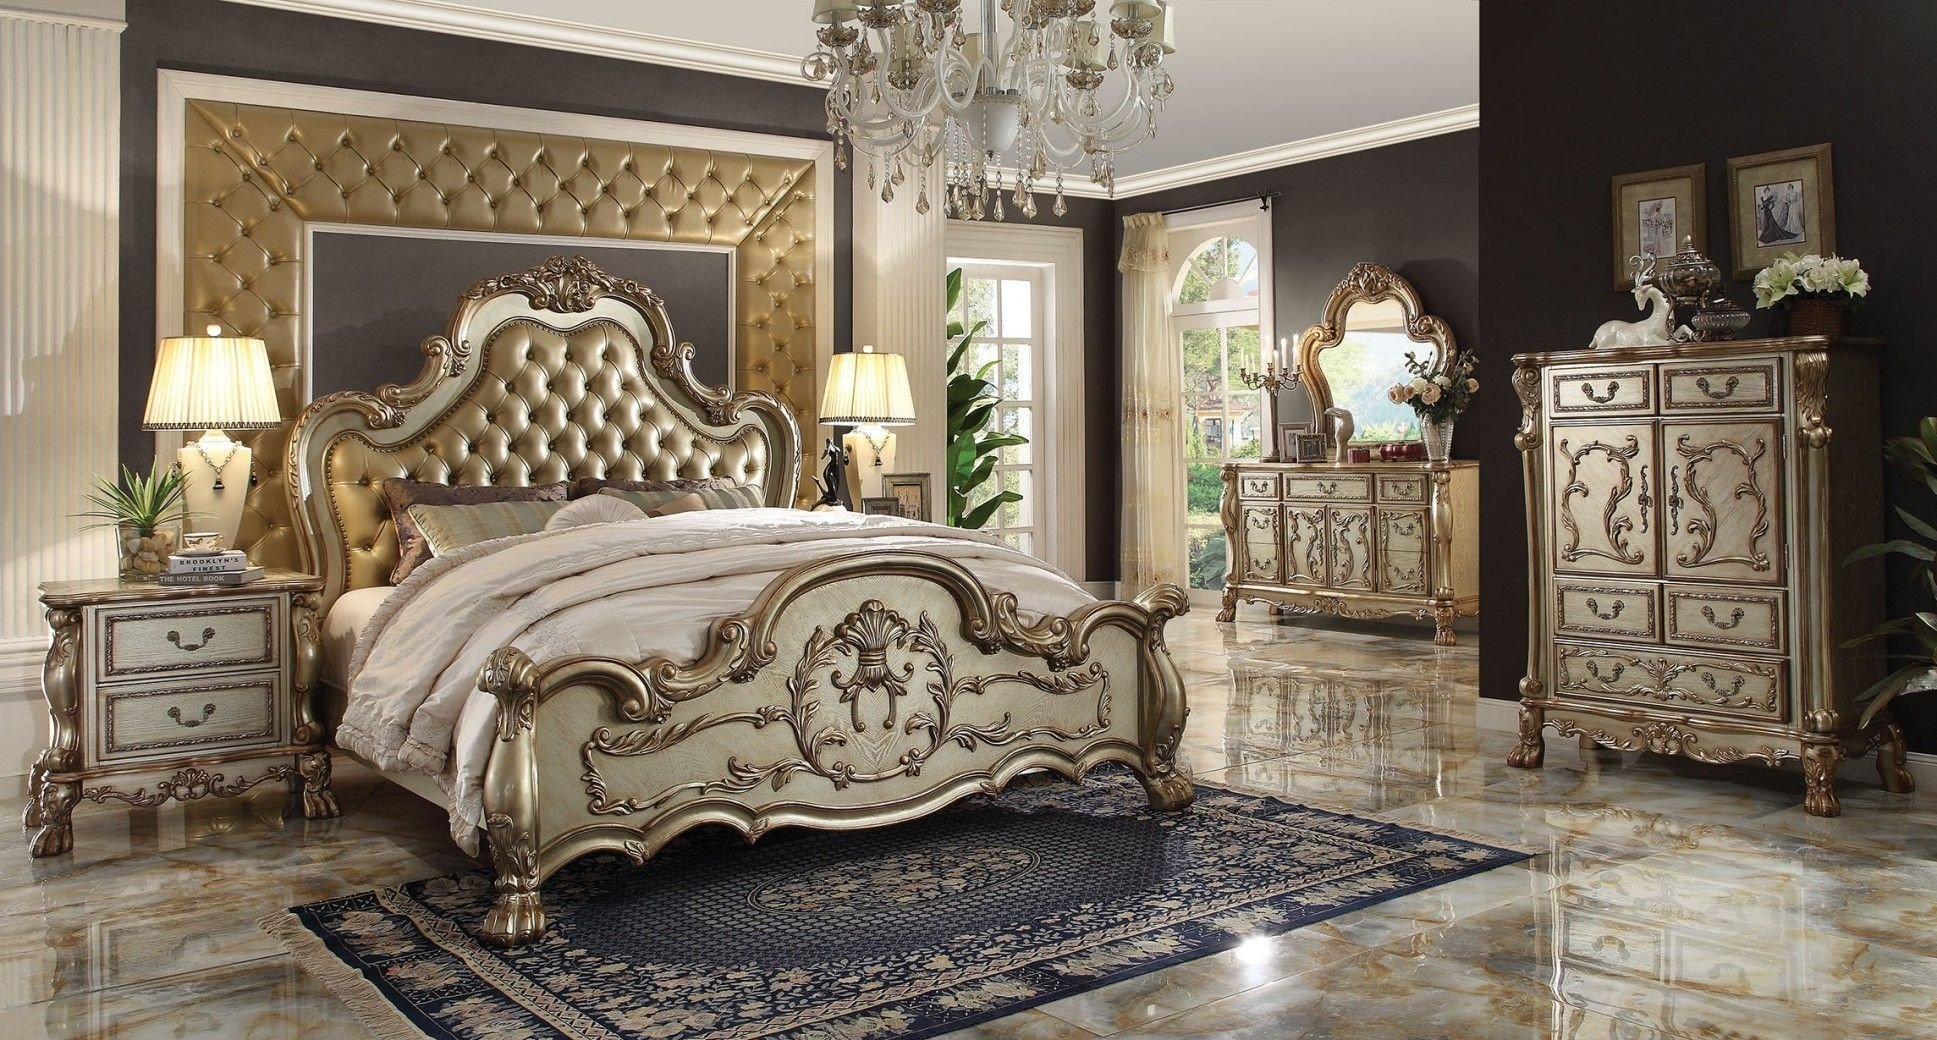 Tufted King Bedroom Set New Acme Dresden Wood Pu Tufted Panel Bedroom Set